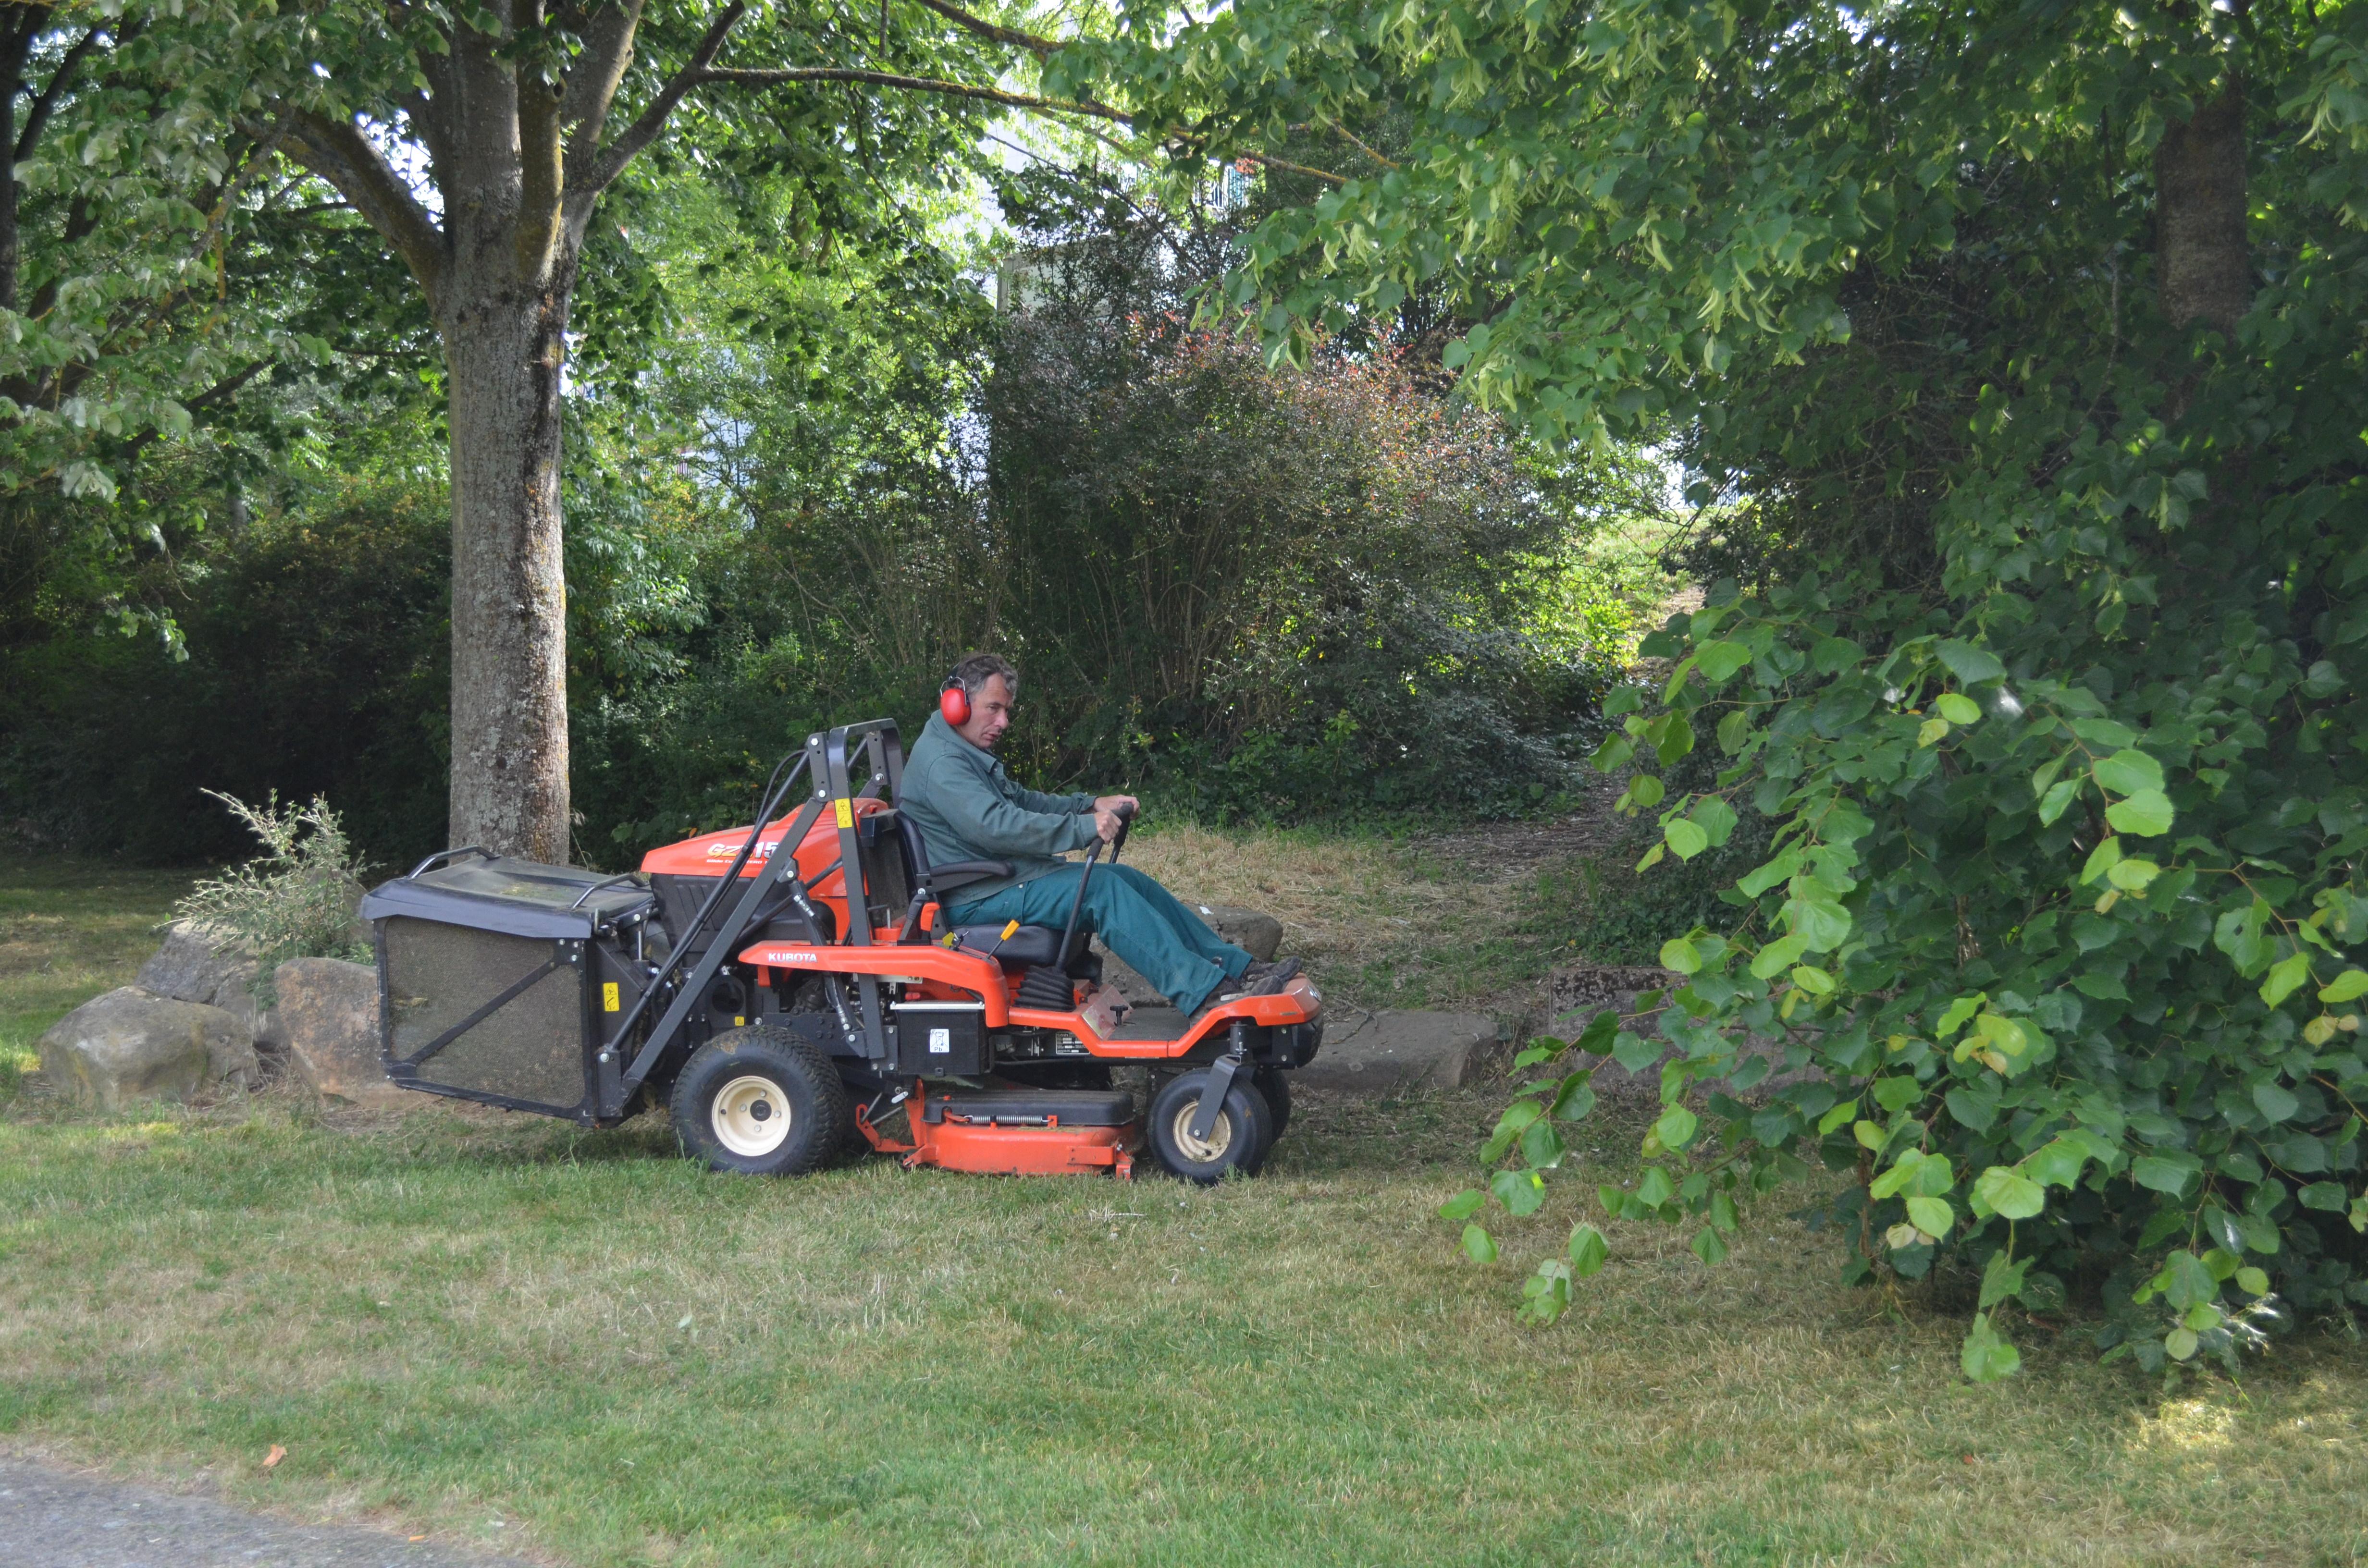 Via28 association les 3r r nover restaurer r habiliter for Association entretien espaces verts